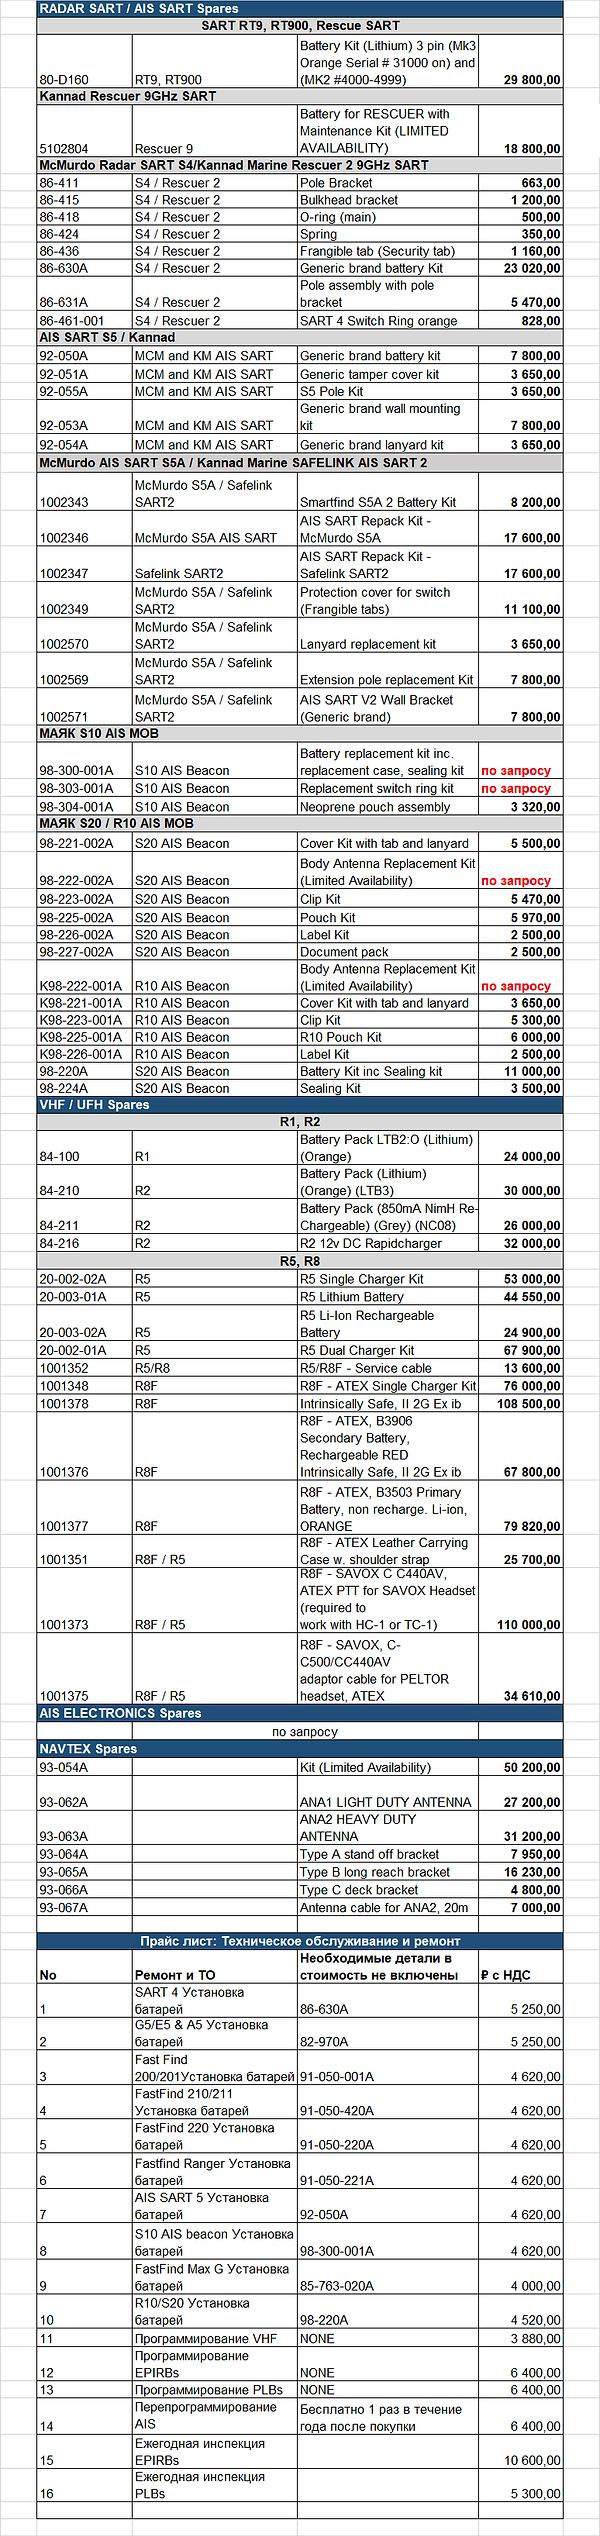 2 McM Price 2021.png